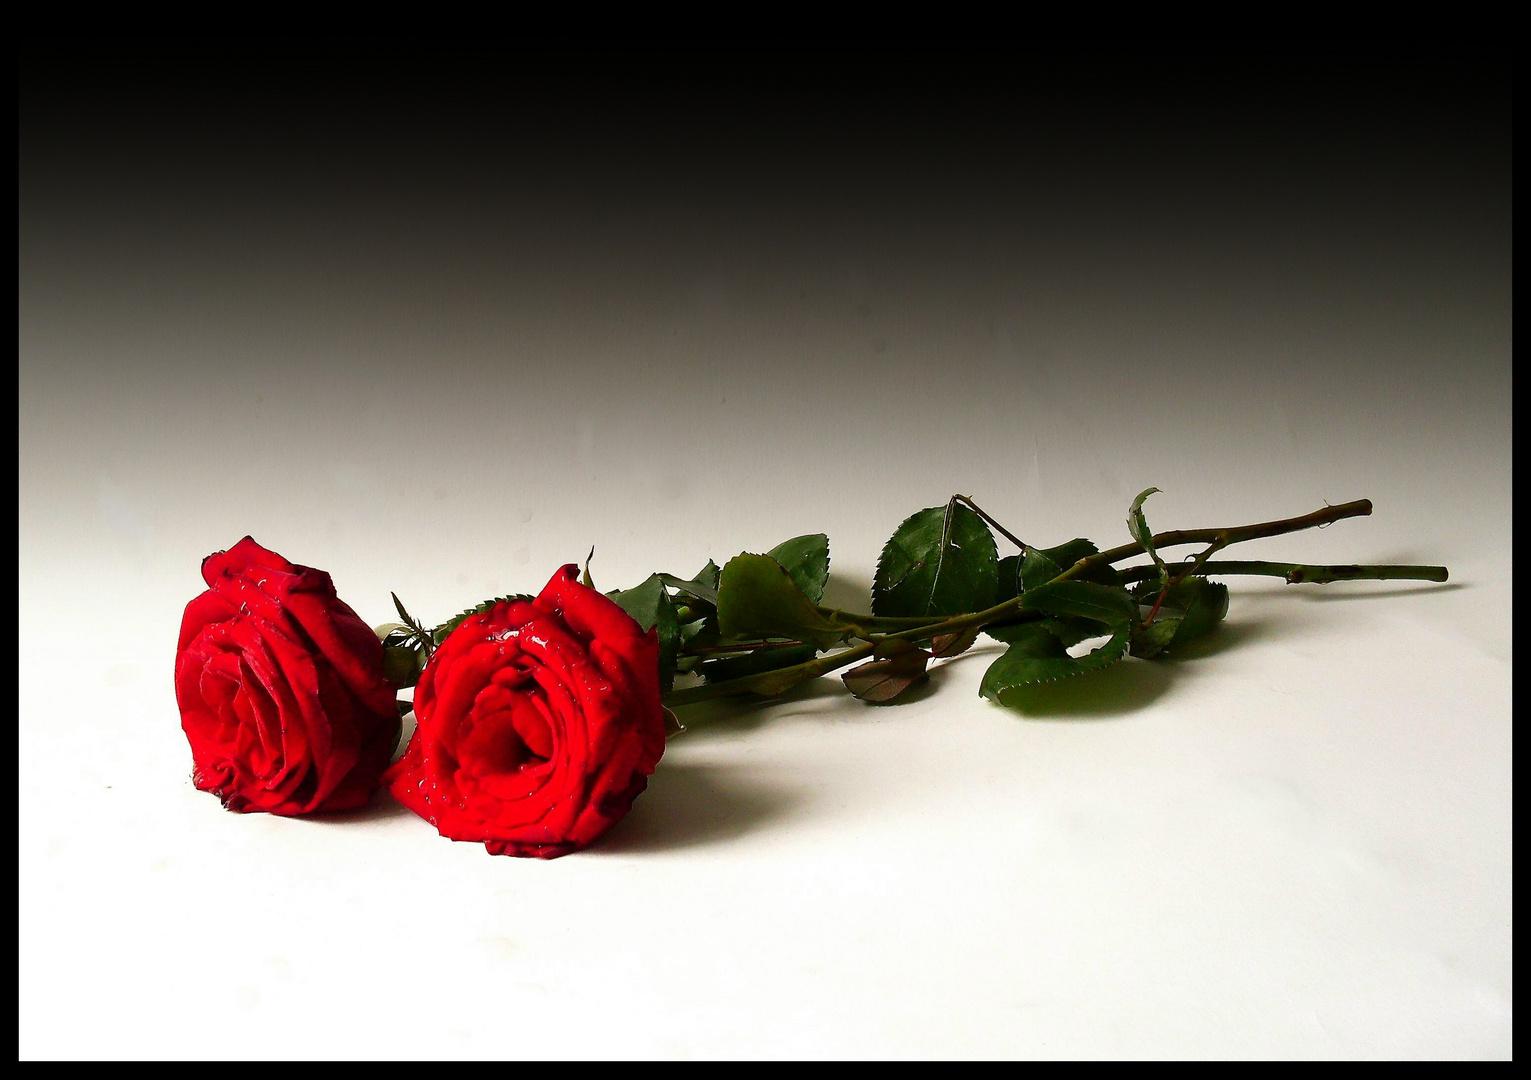 El Poder de las rosas